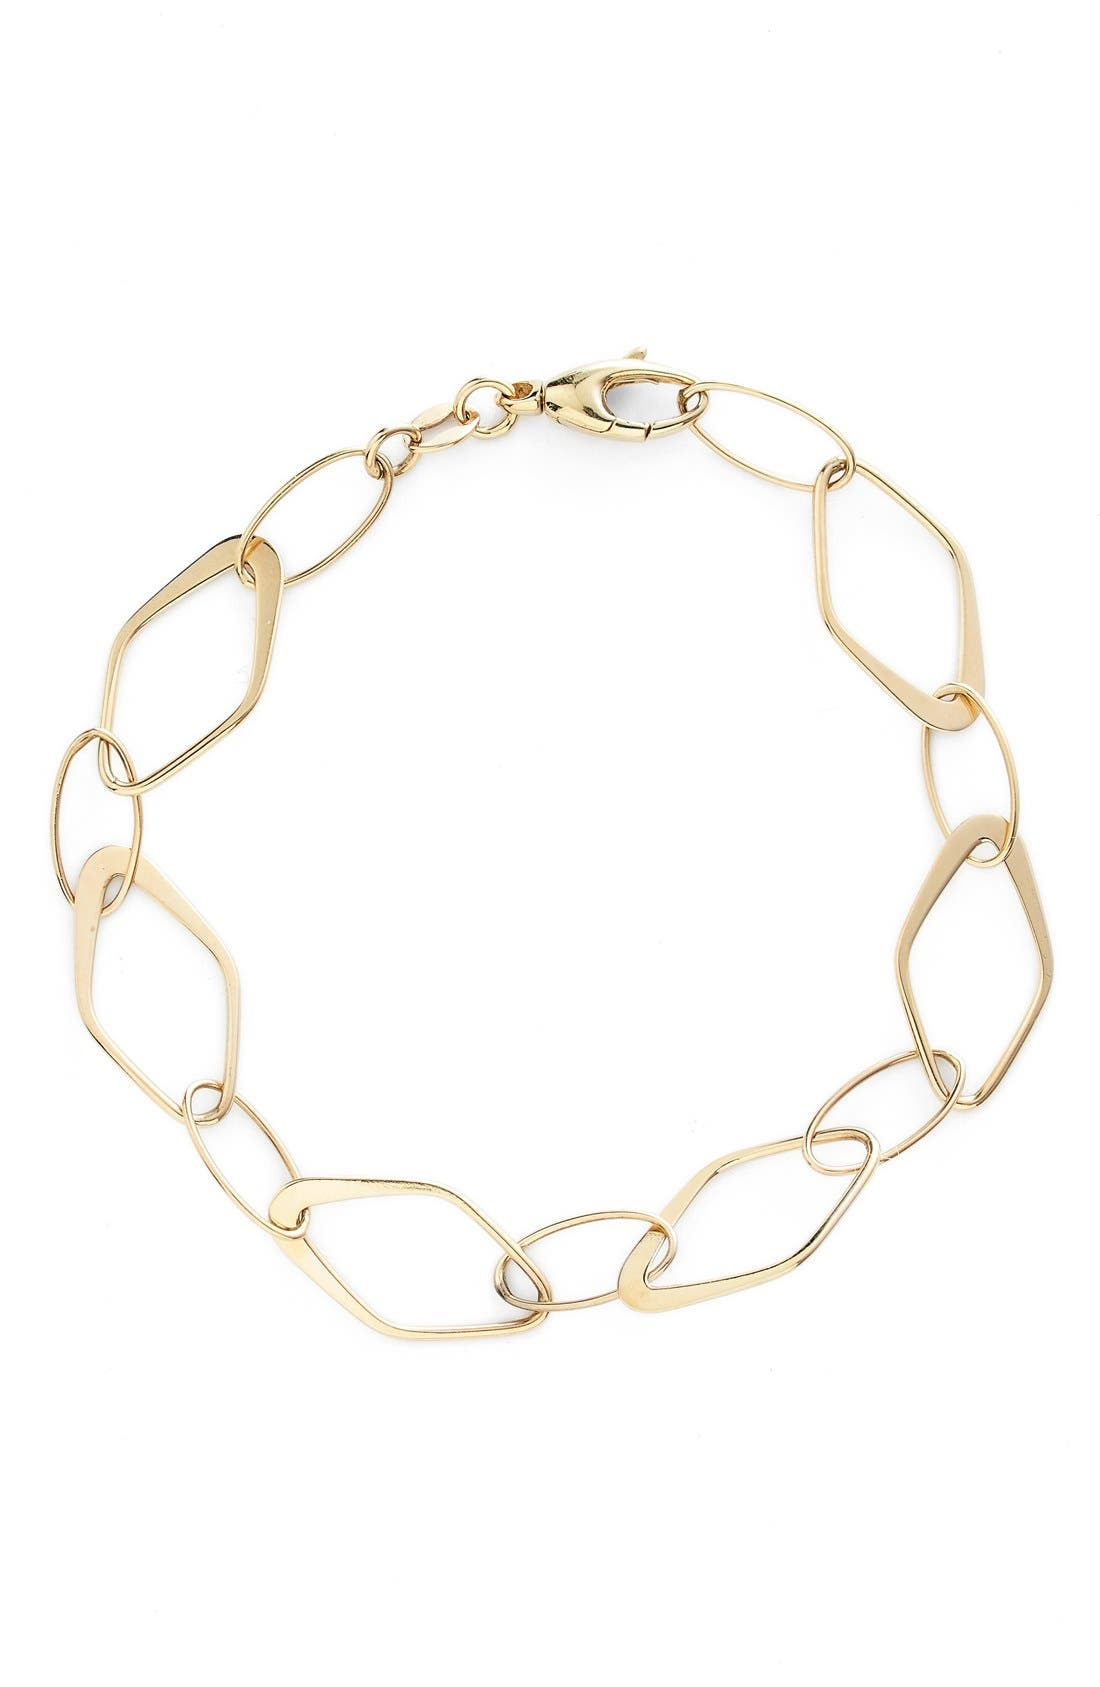 Main Image - Bony Levy Link Bracelet (Nordstrom Exclusive)